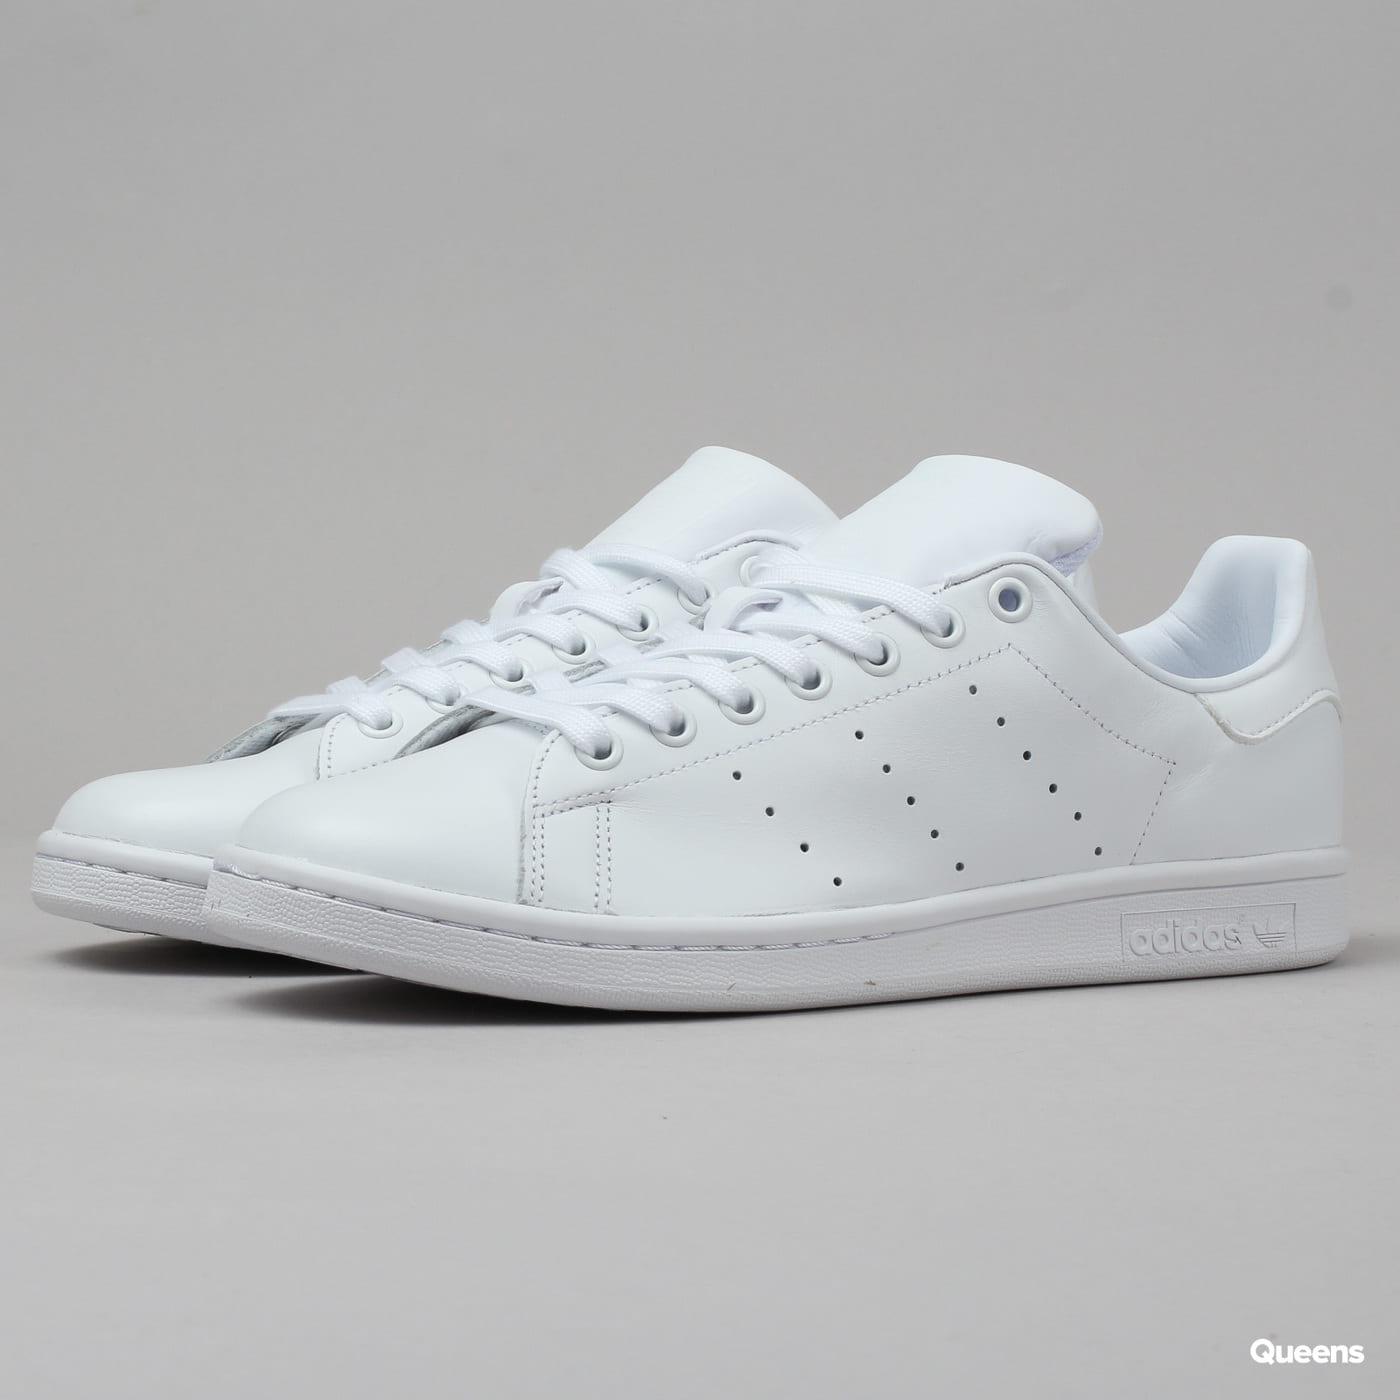 big sale 651e9 10895 adidas Originals Stan Smith ftwwht / ftwwht / ftwwht